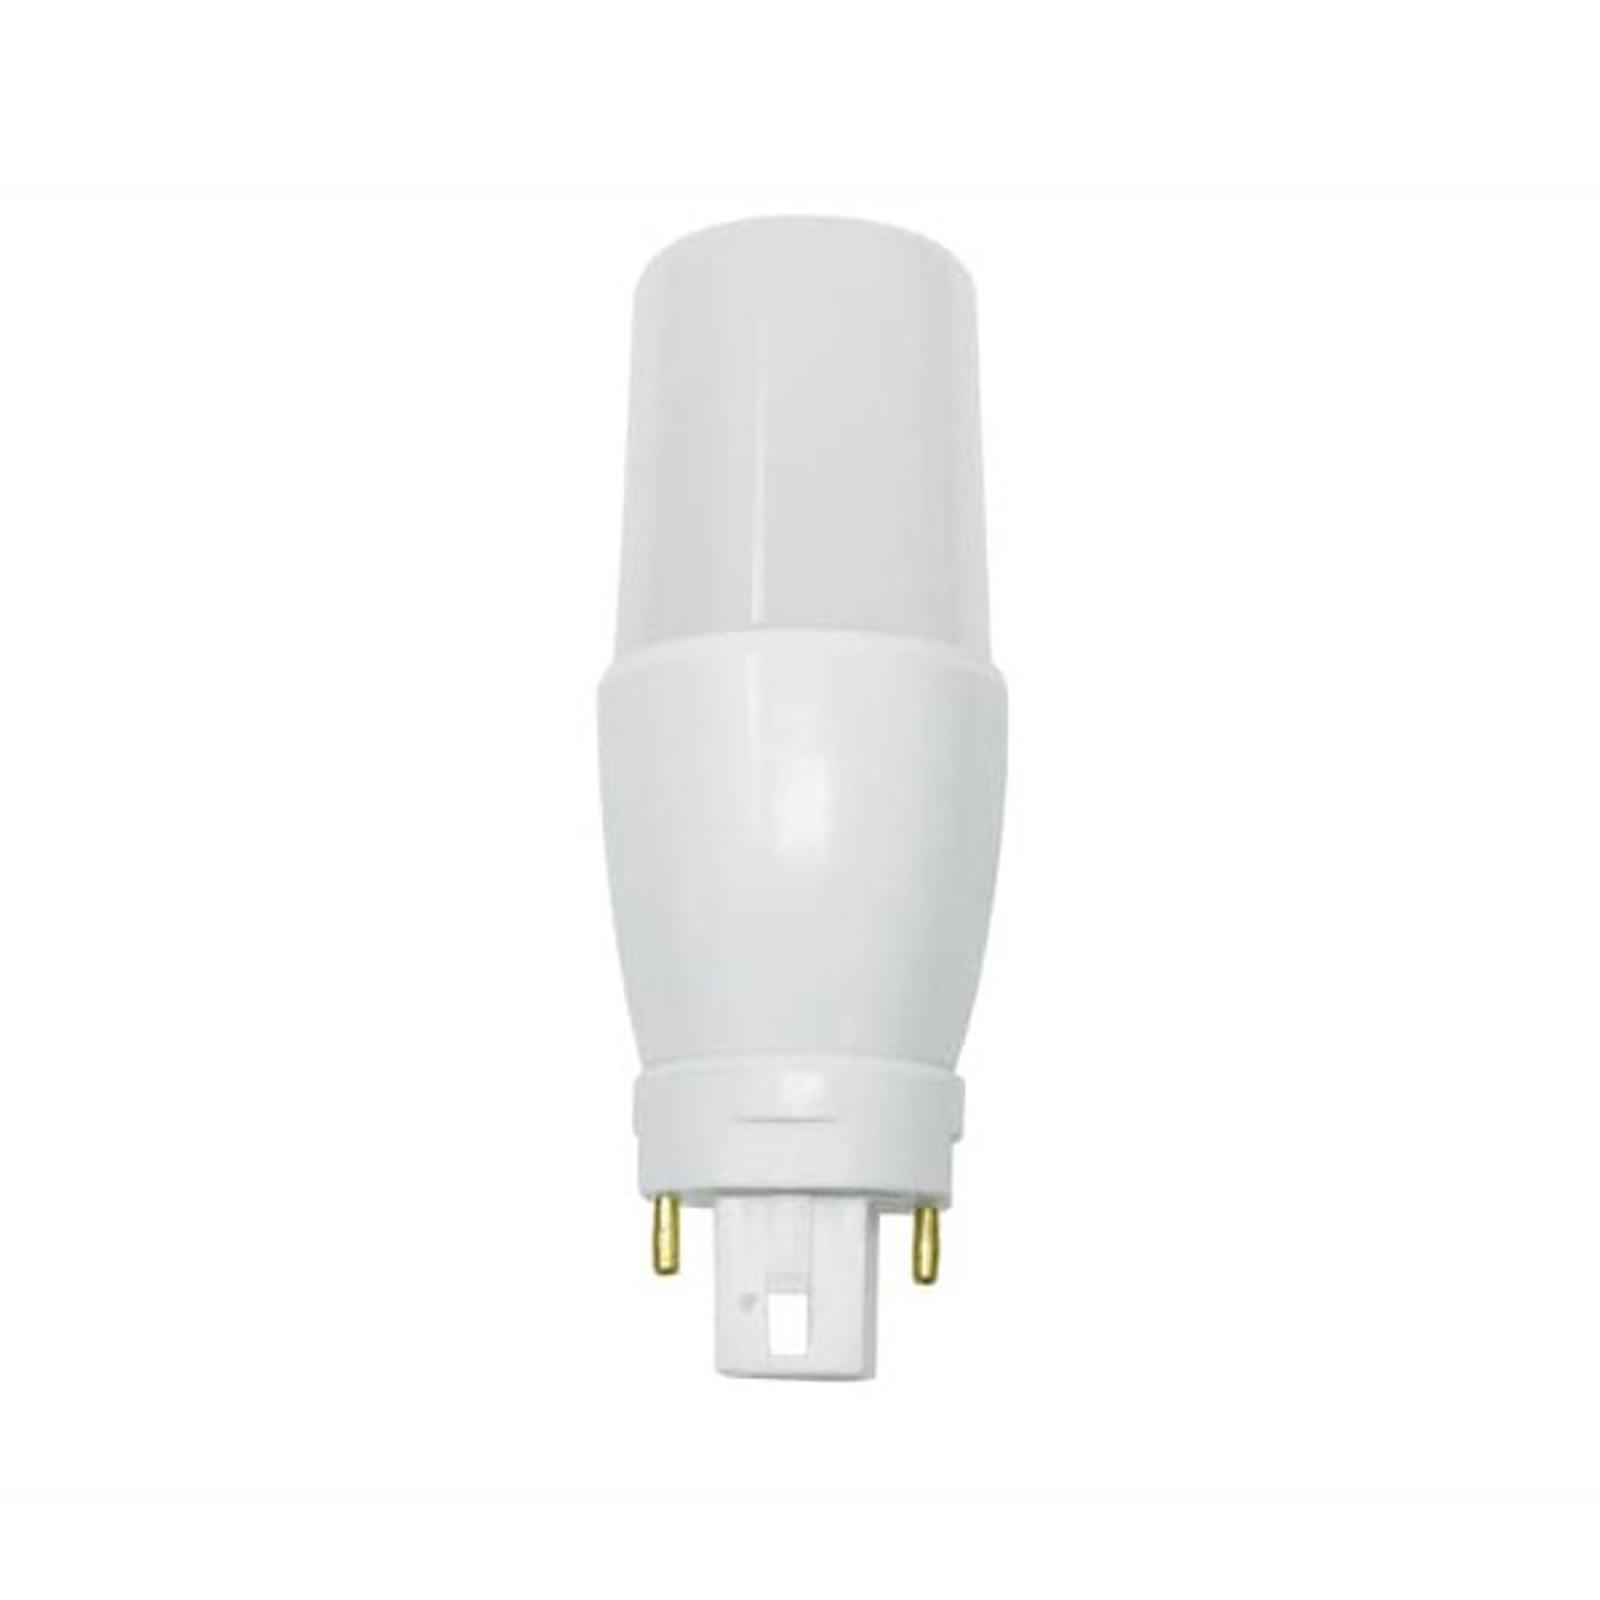 LED-Lampe G24 7W Universalsockel warmweiß 3.000K kaufen